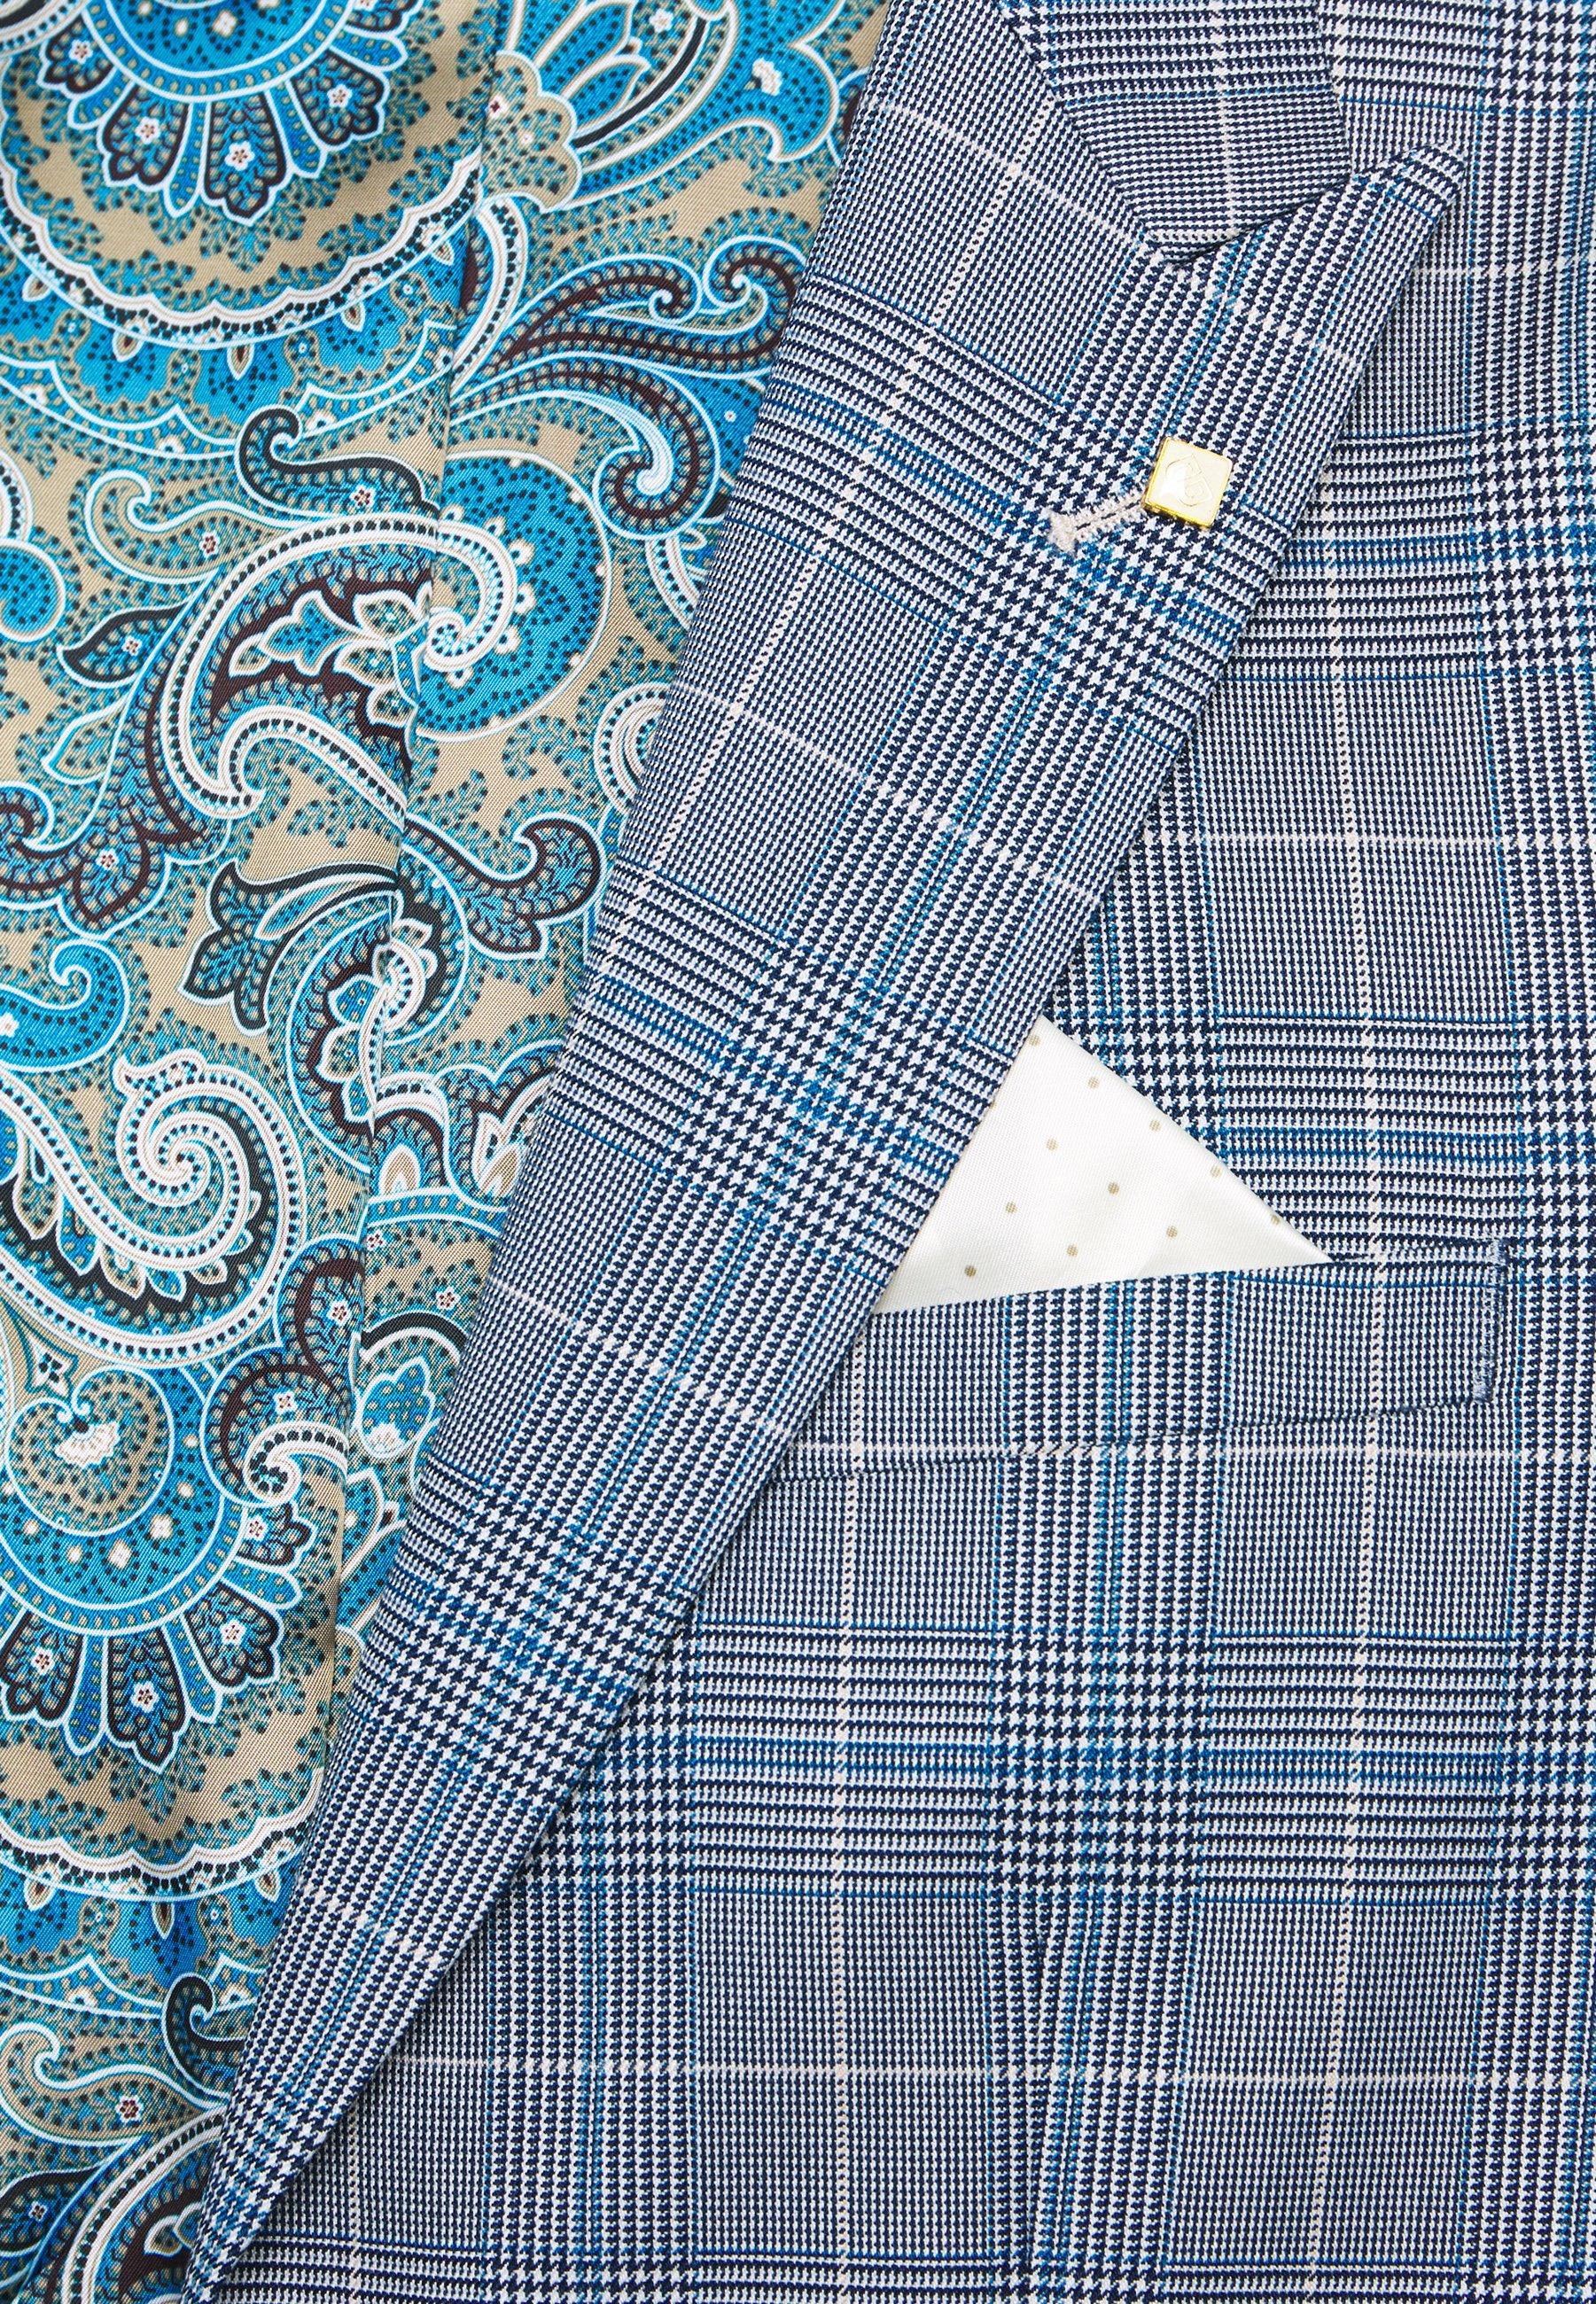 Burton Menswear London LIGHT POW CHECK - Marynarka garniturowa - blue - Odzież męska 2020